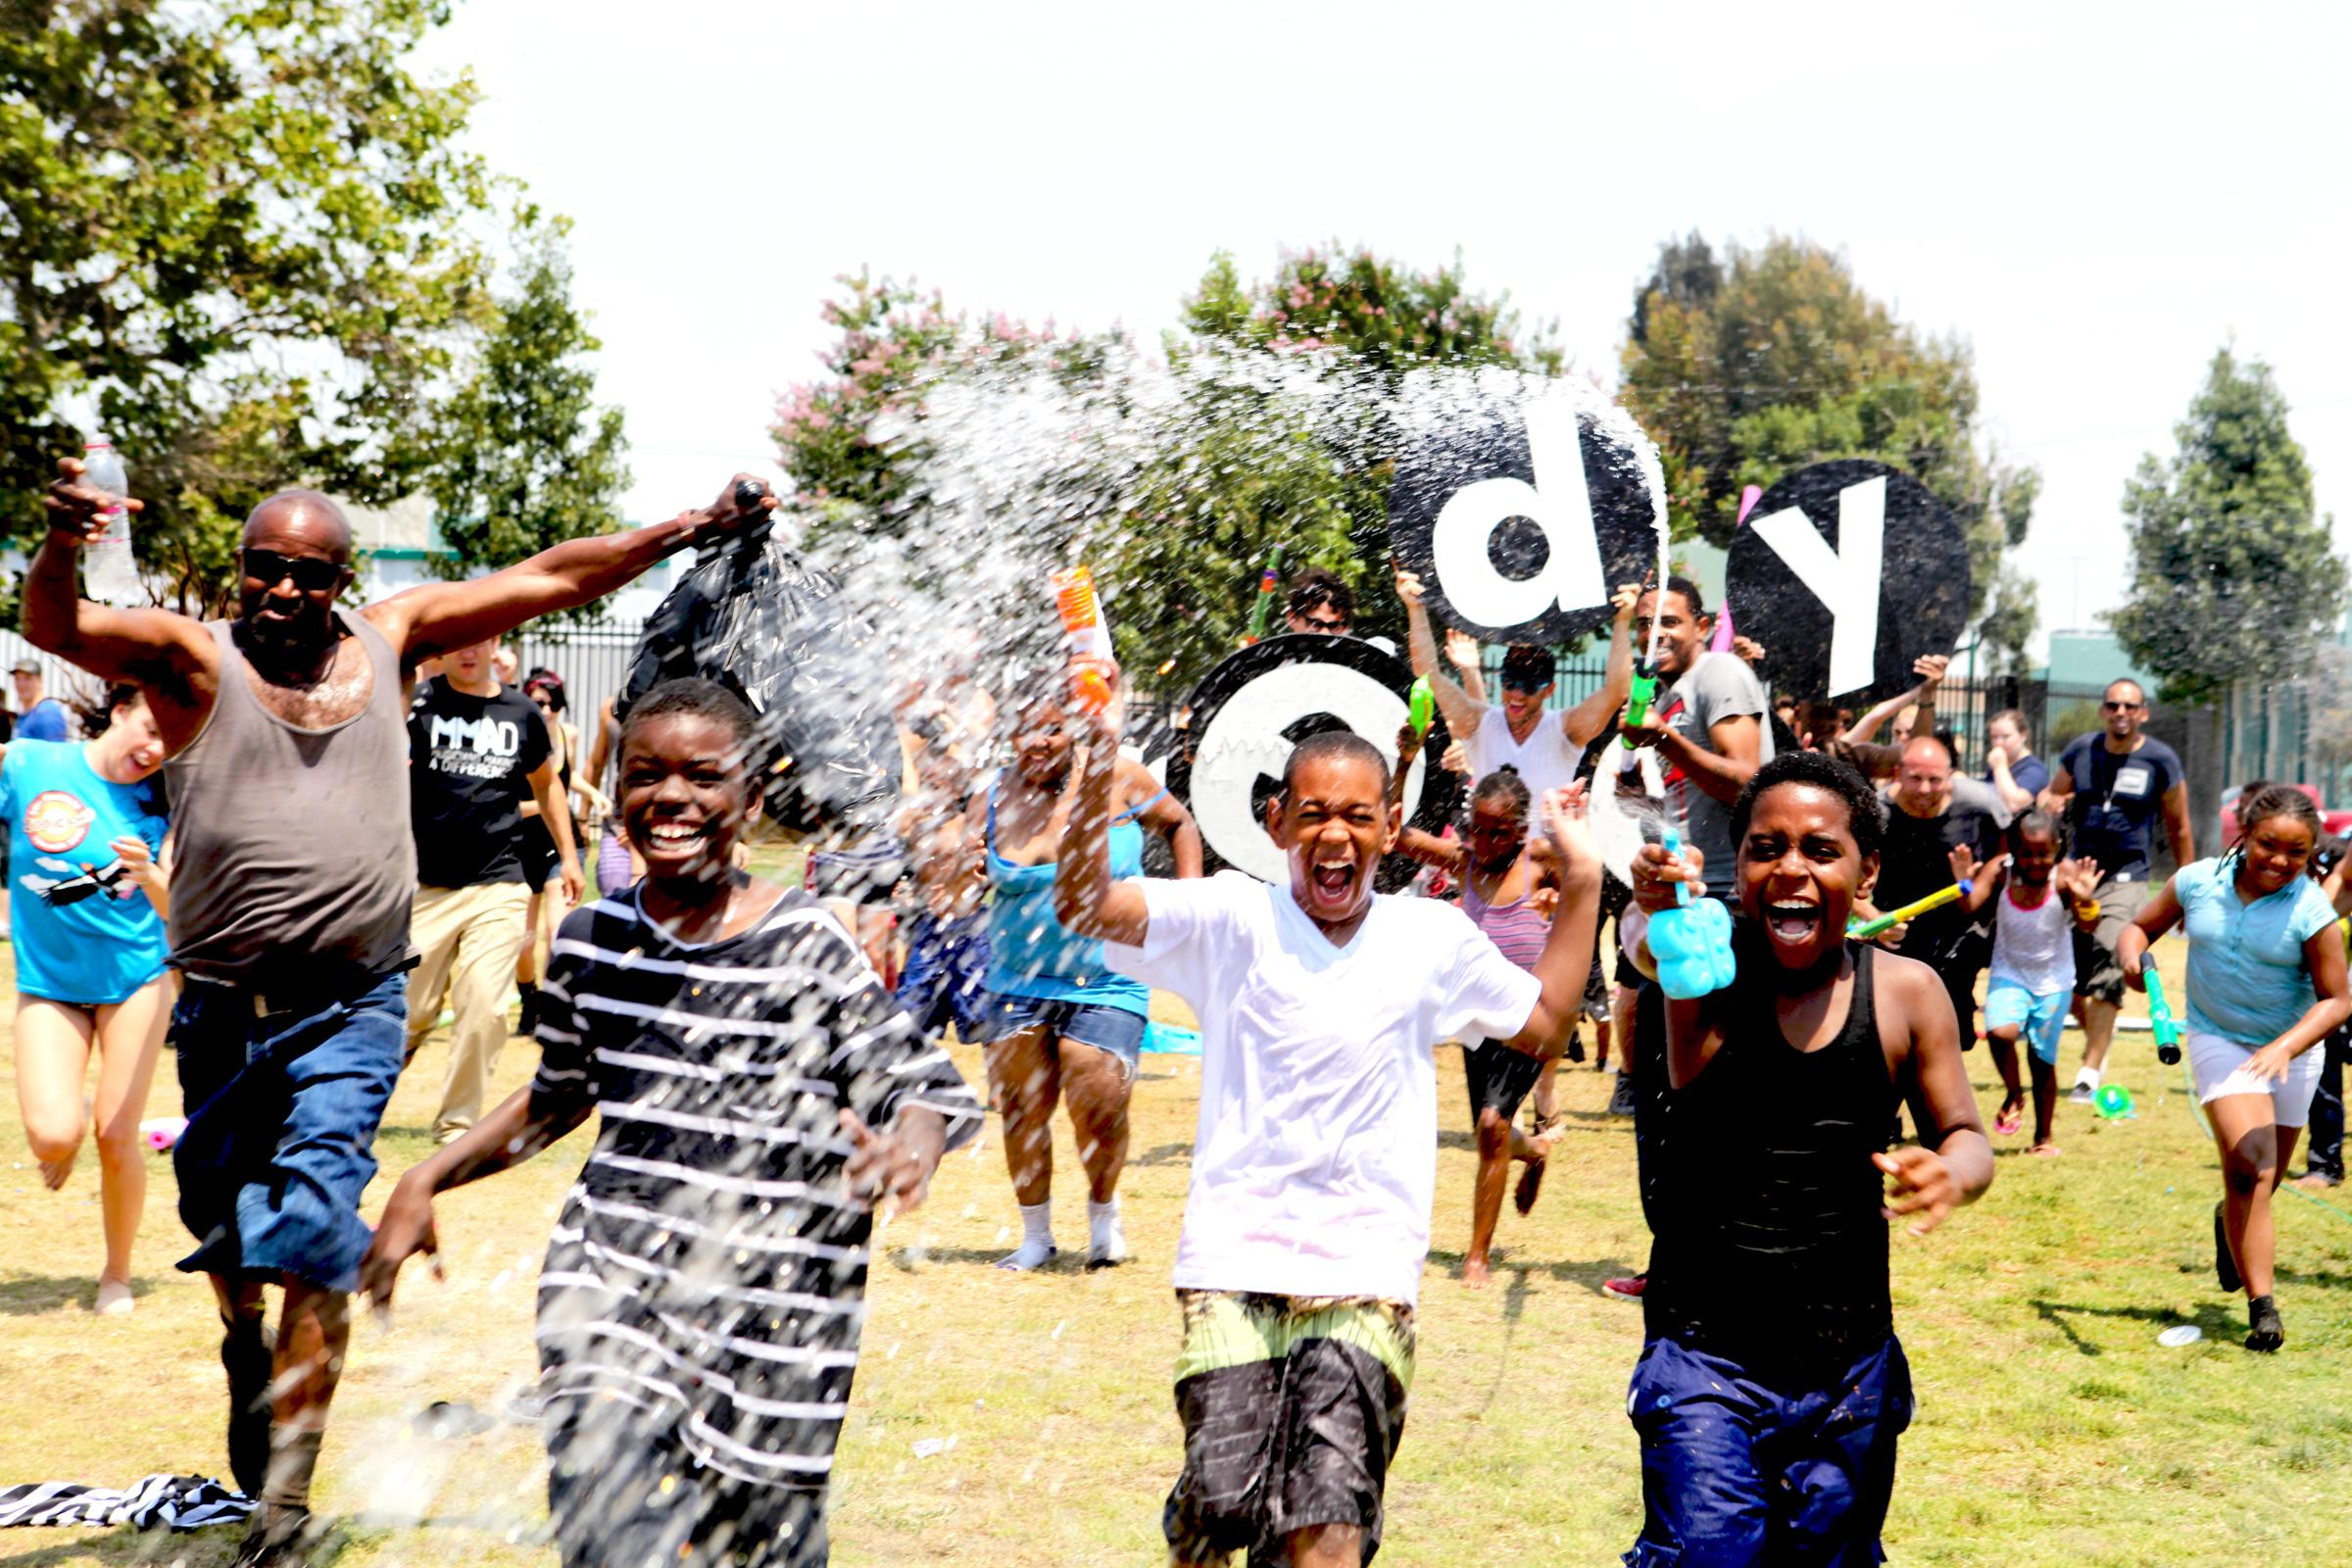 Justin Mayo UNICEF UN:: Charity Youth Mentoring :: Humanitarian Relief :: Fun Fashion Music Healthy :: Hope Help :: Water Kids Children Teens College Intern :: Passion Creativity Community Humanity WATER SPLASH BASH RUN.jpg